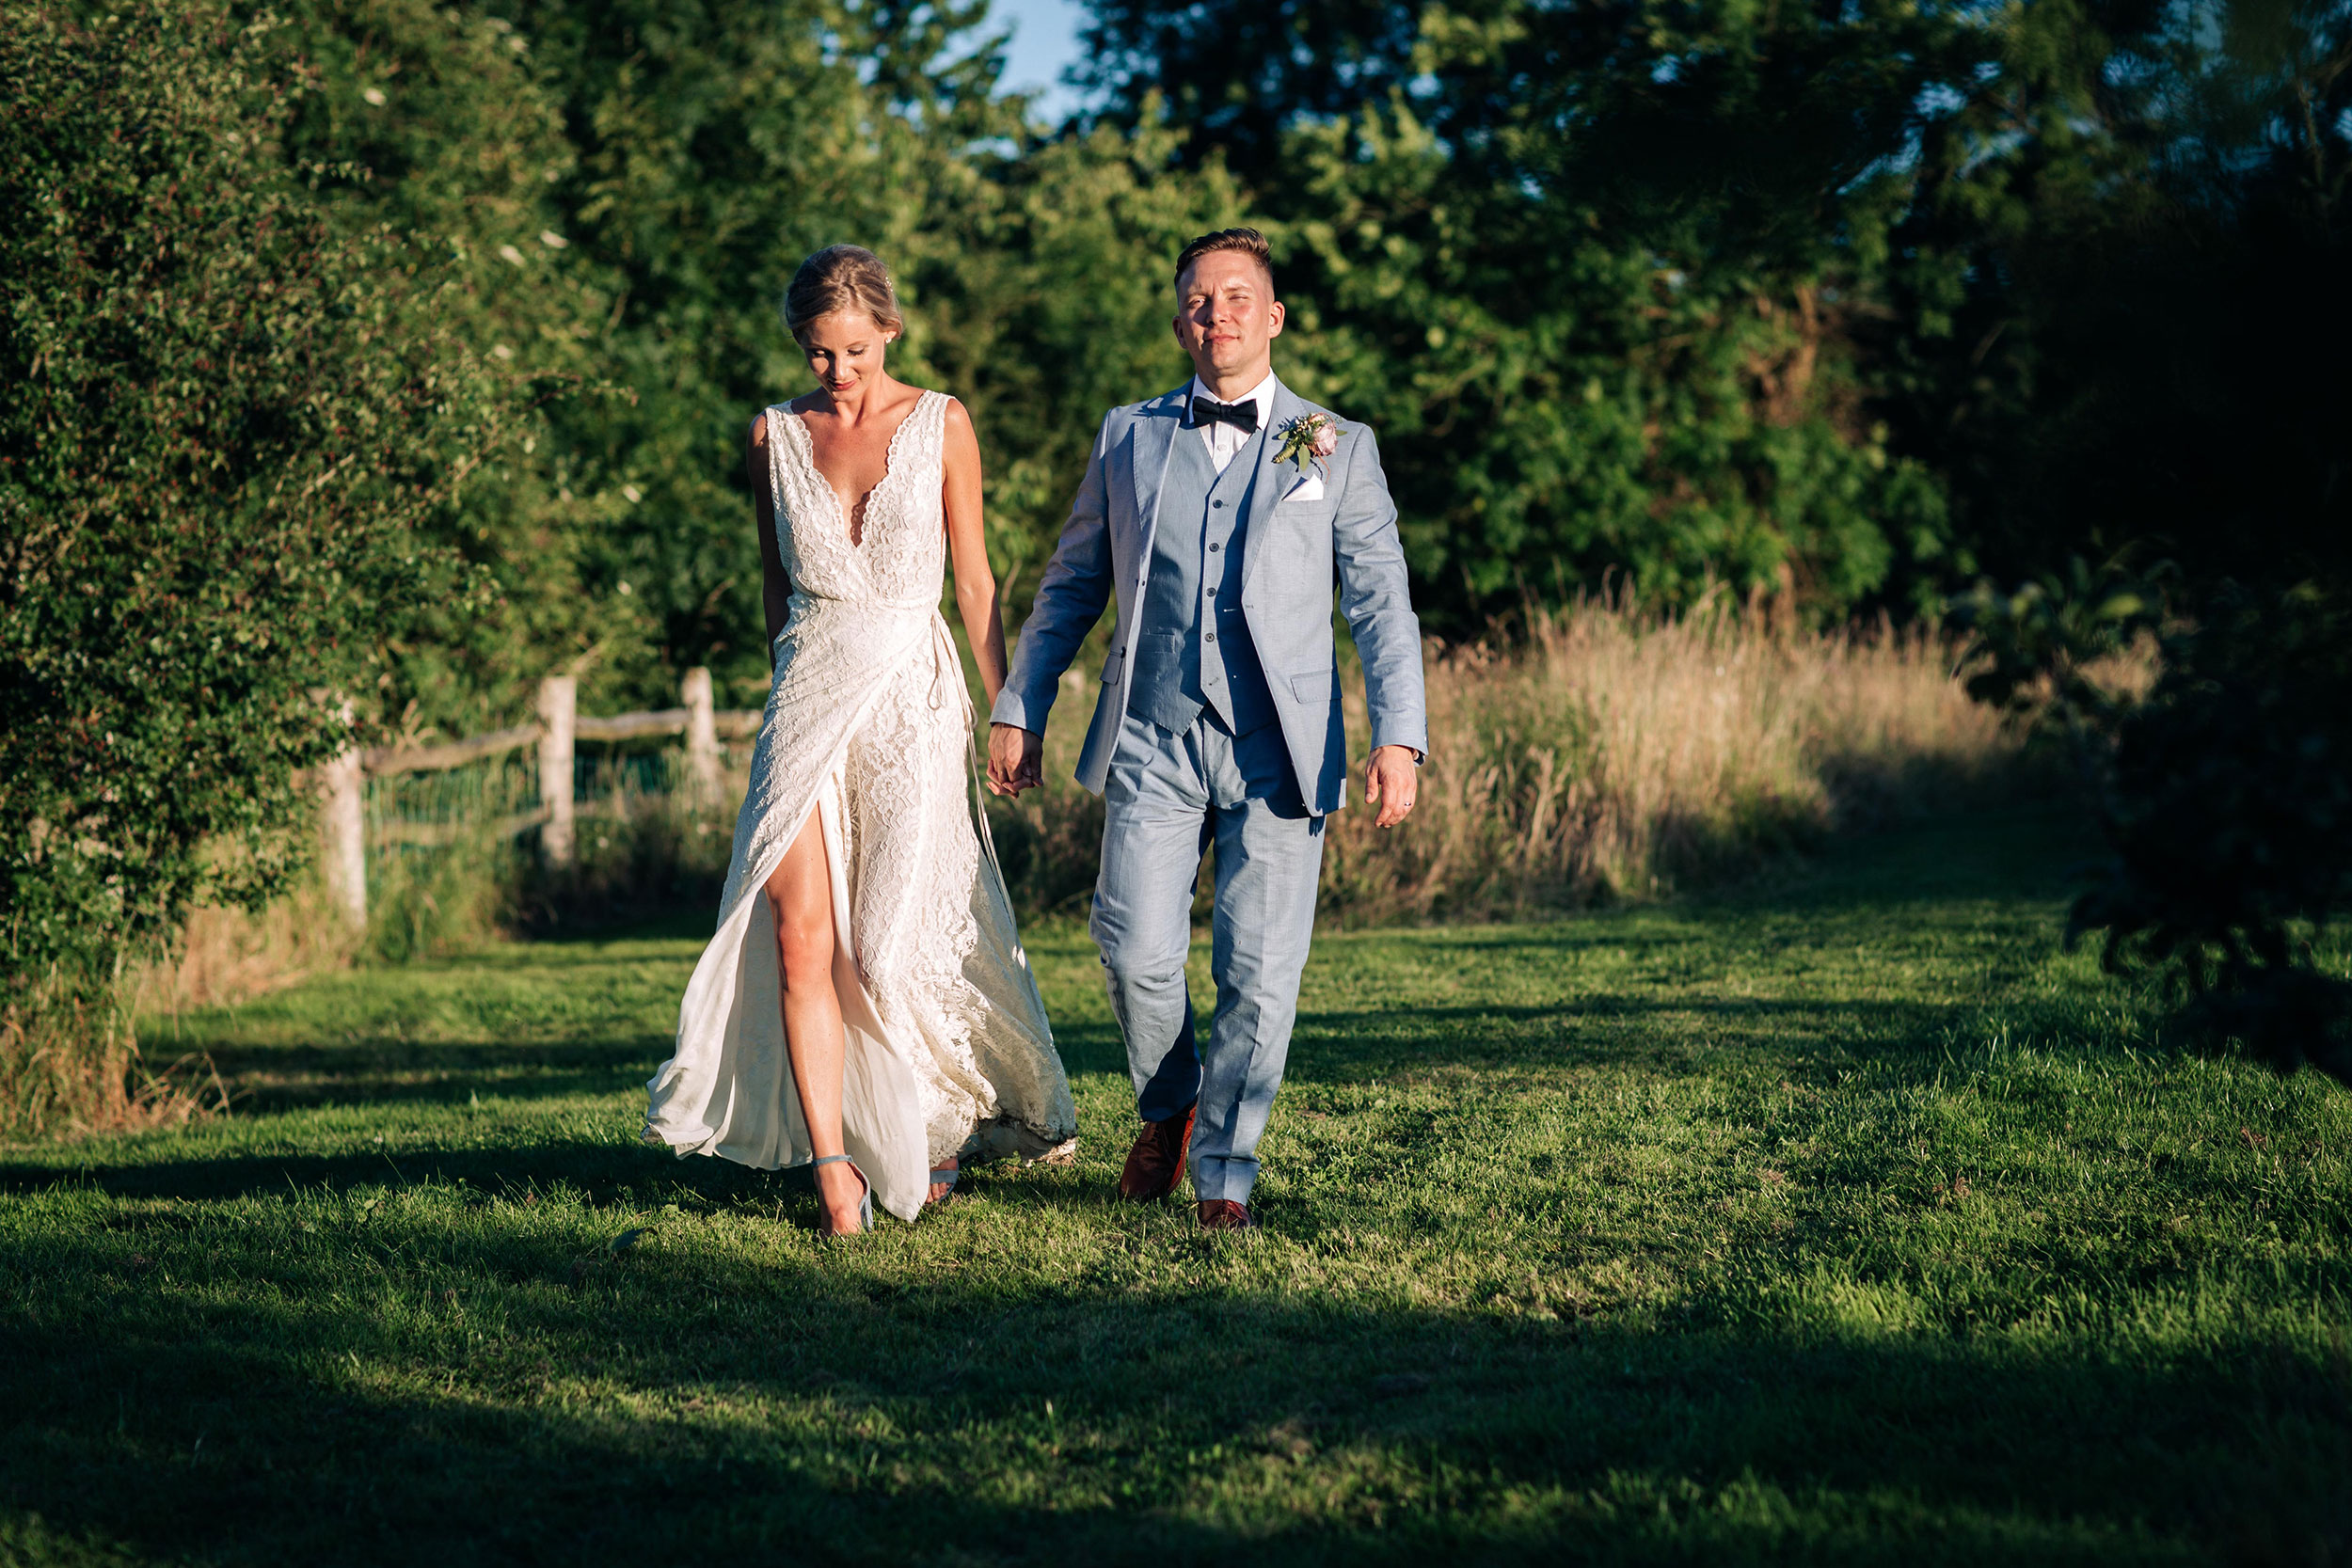 16.07.16-Tanya-&-Jethro-Wedding-Selection-77.jpg